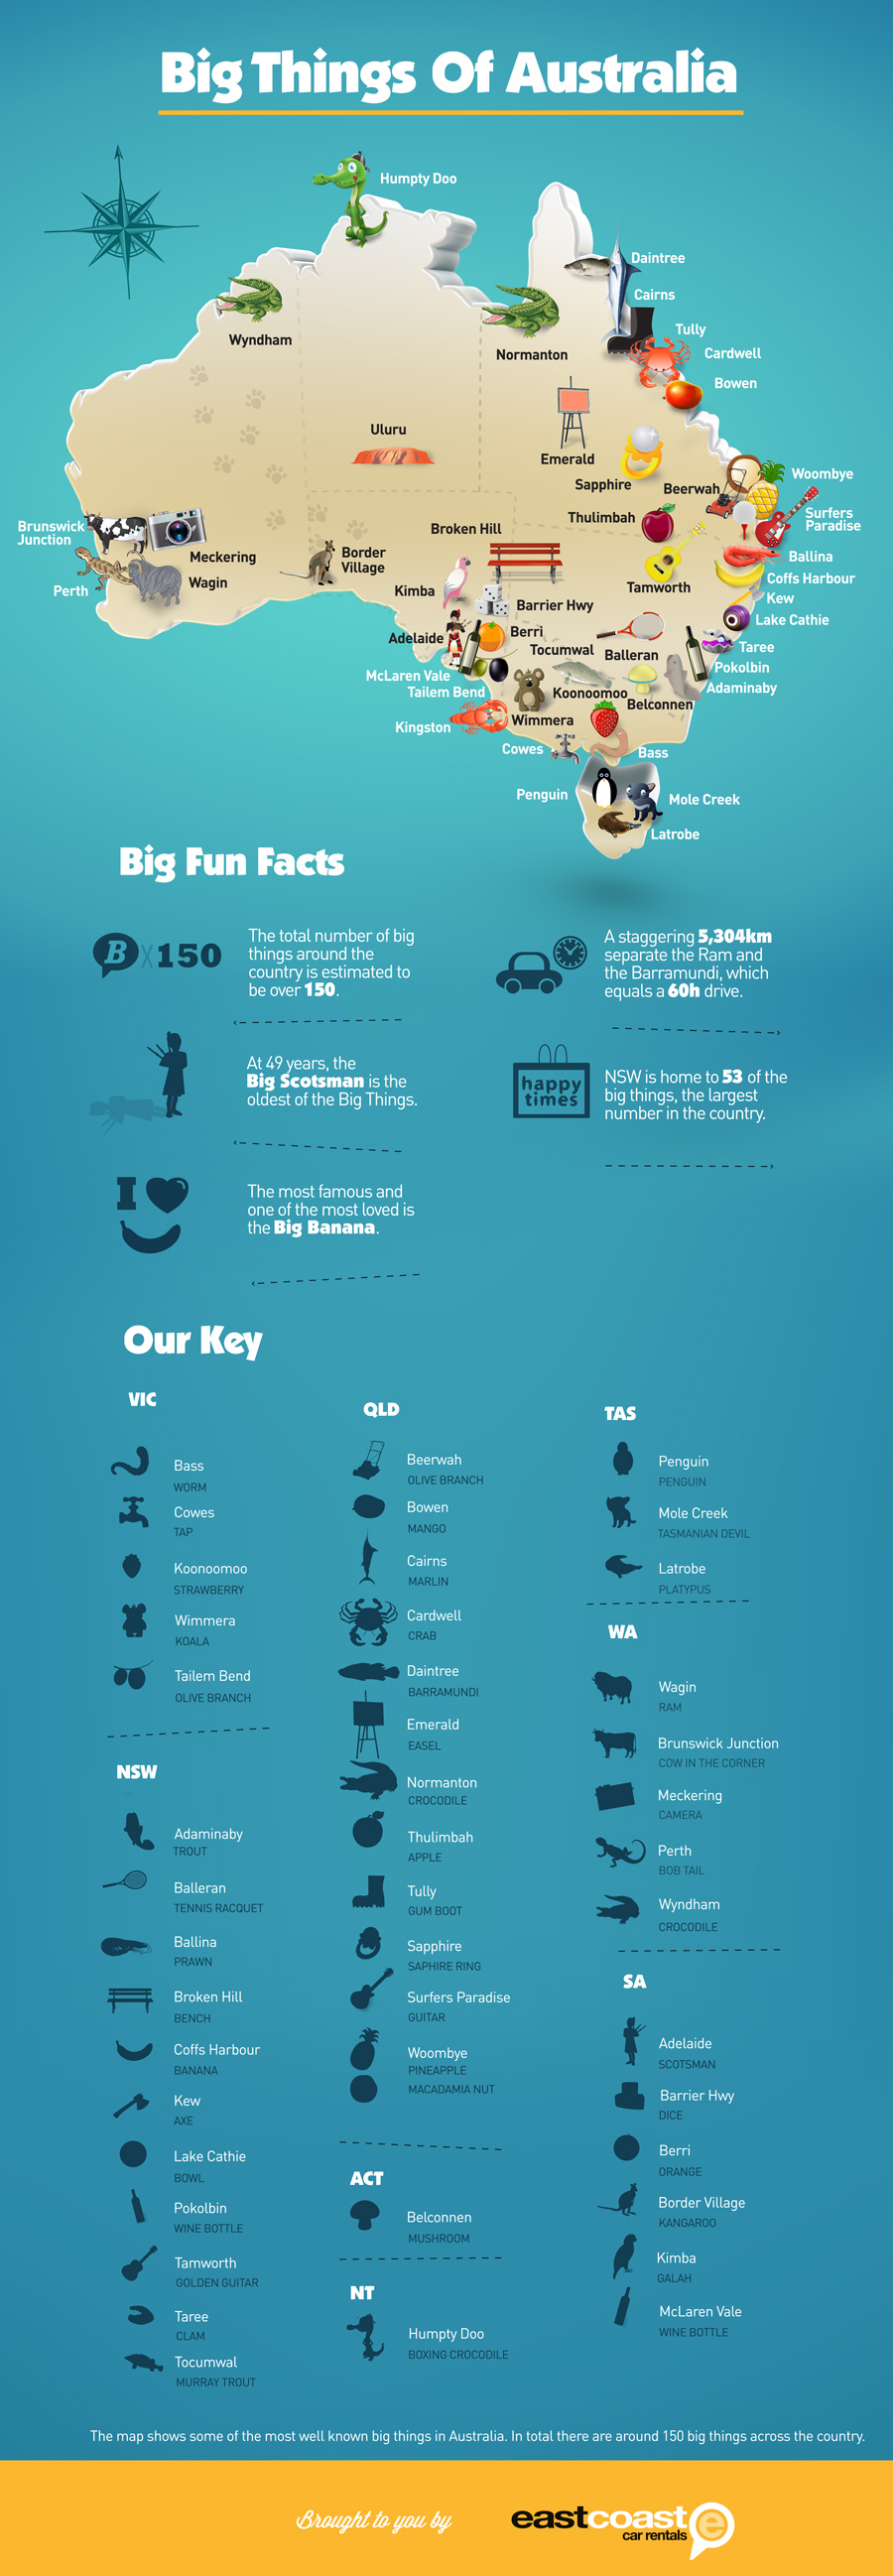 Big things of Australia Info Map